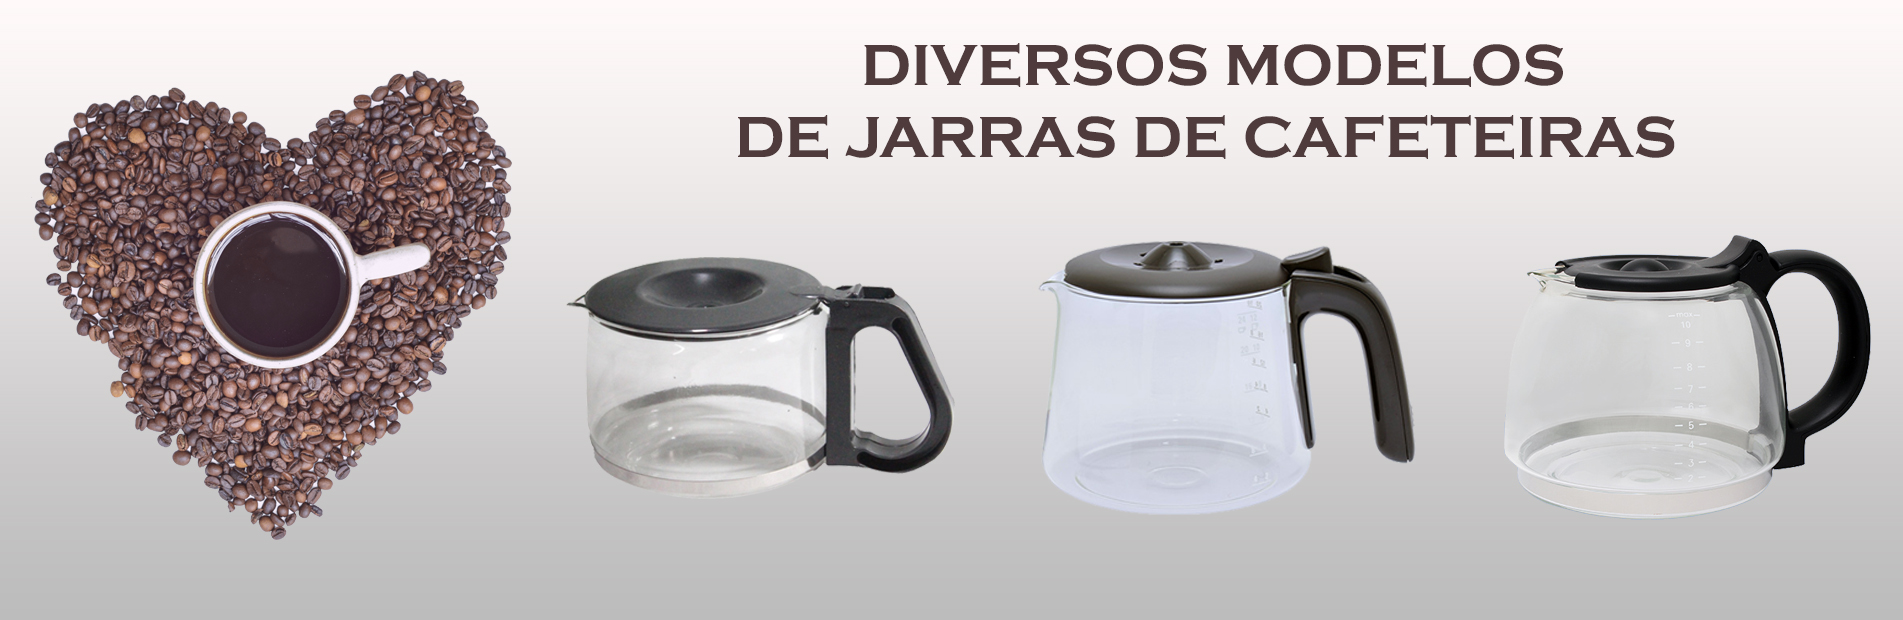 Jarra Cafeteiras